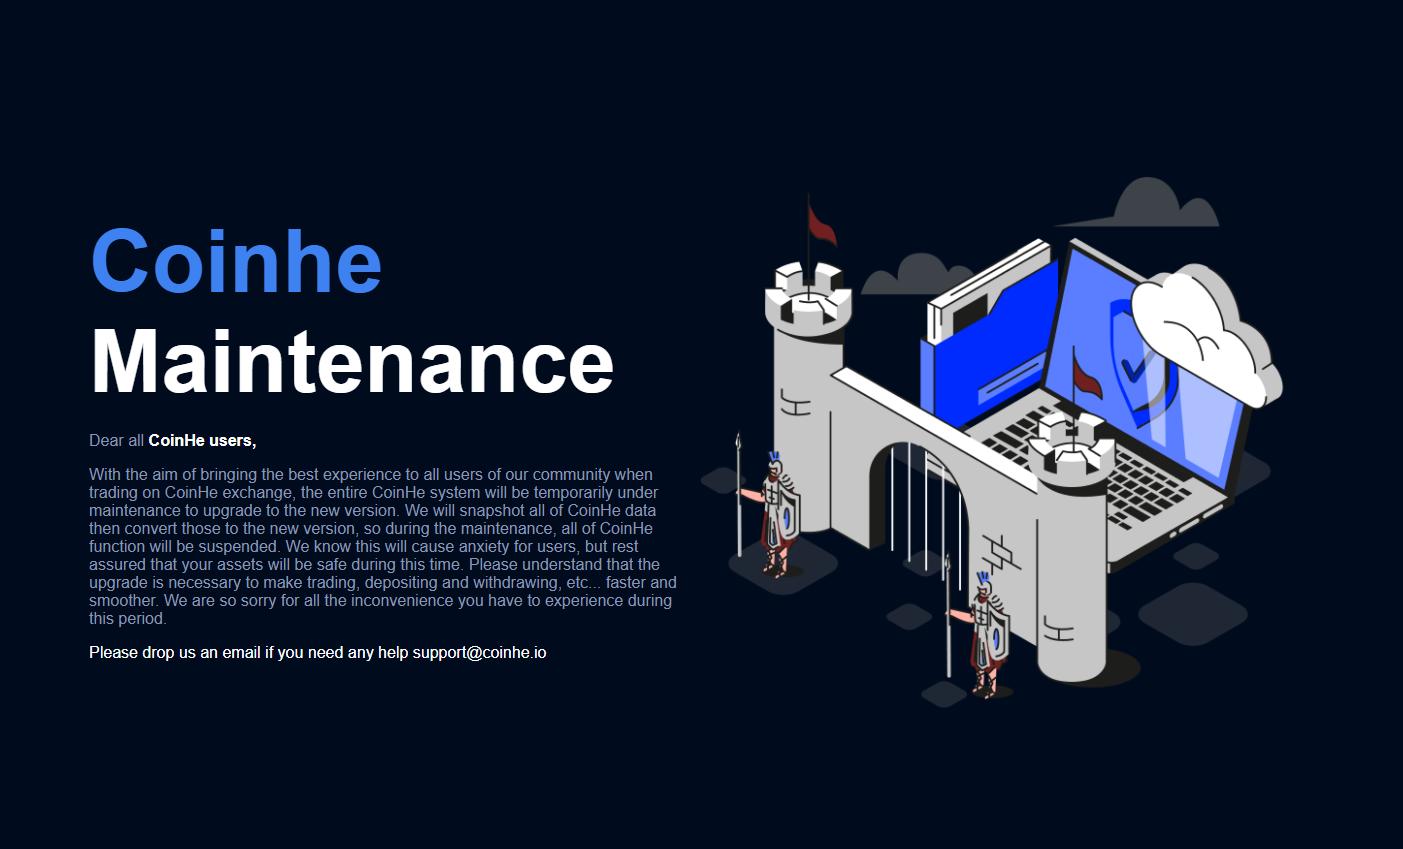 Coinhe Maintenance Message